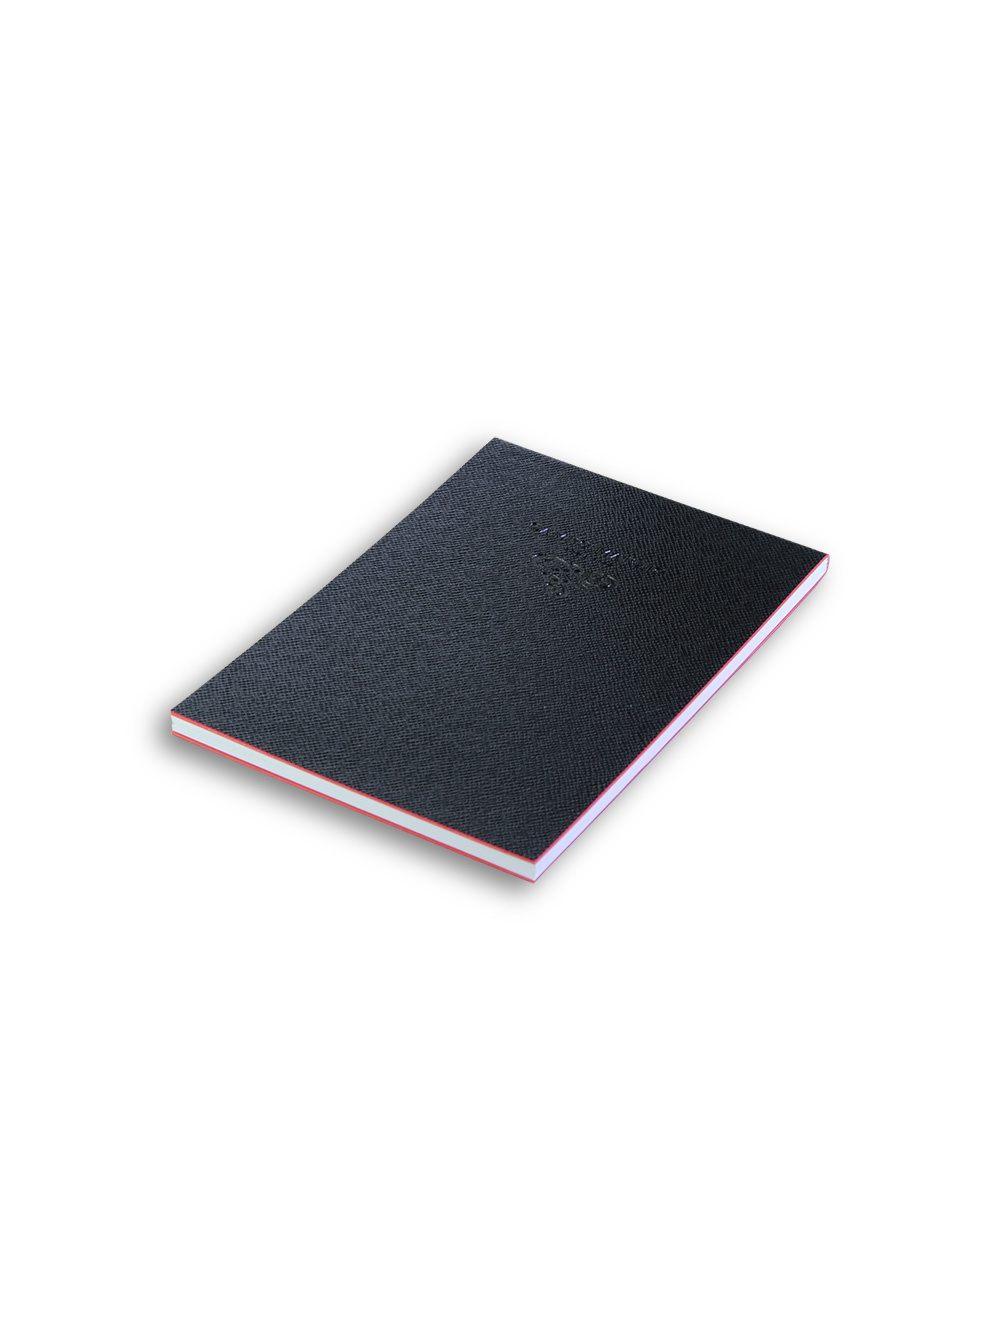 Notes 11x16 cm Saffiano (white internal paper) - Black